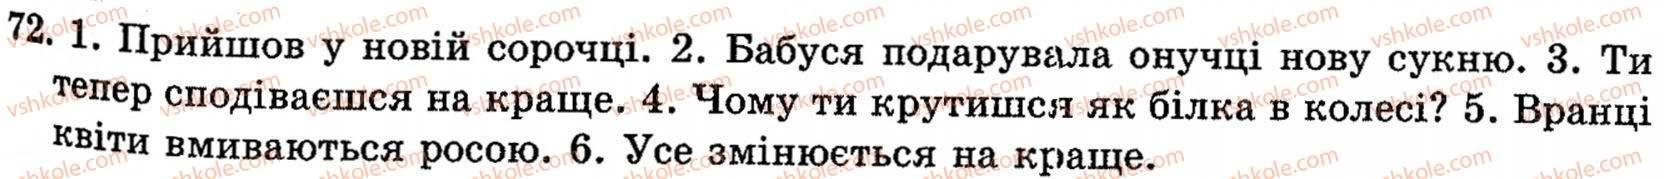 10-ukrayinska-mova-ov-zabolotnij-vv-zabolotnij-72